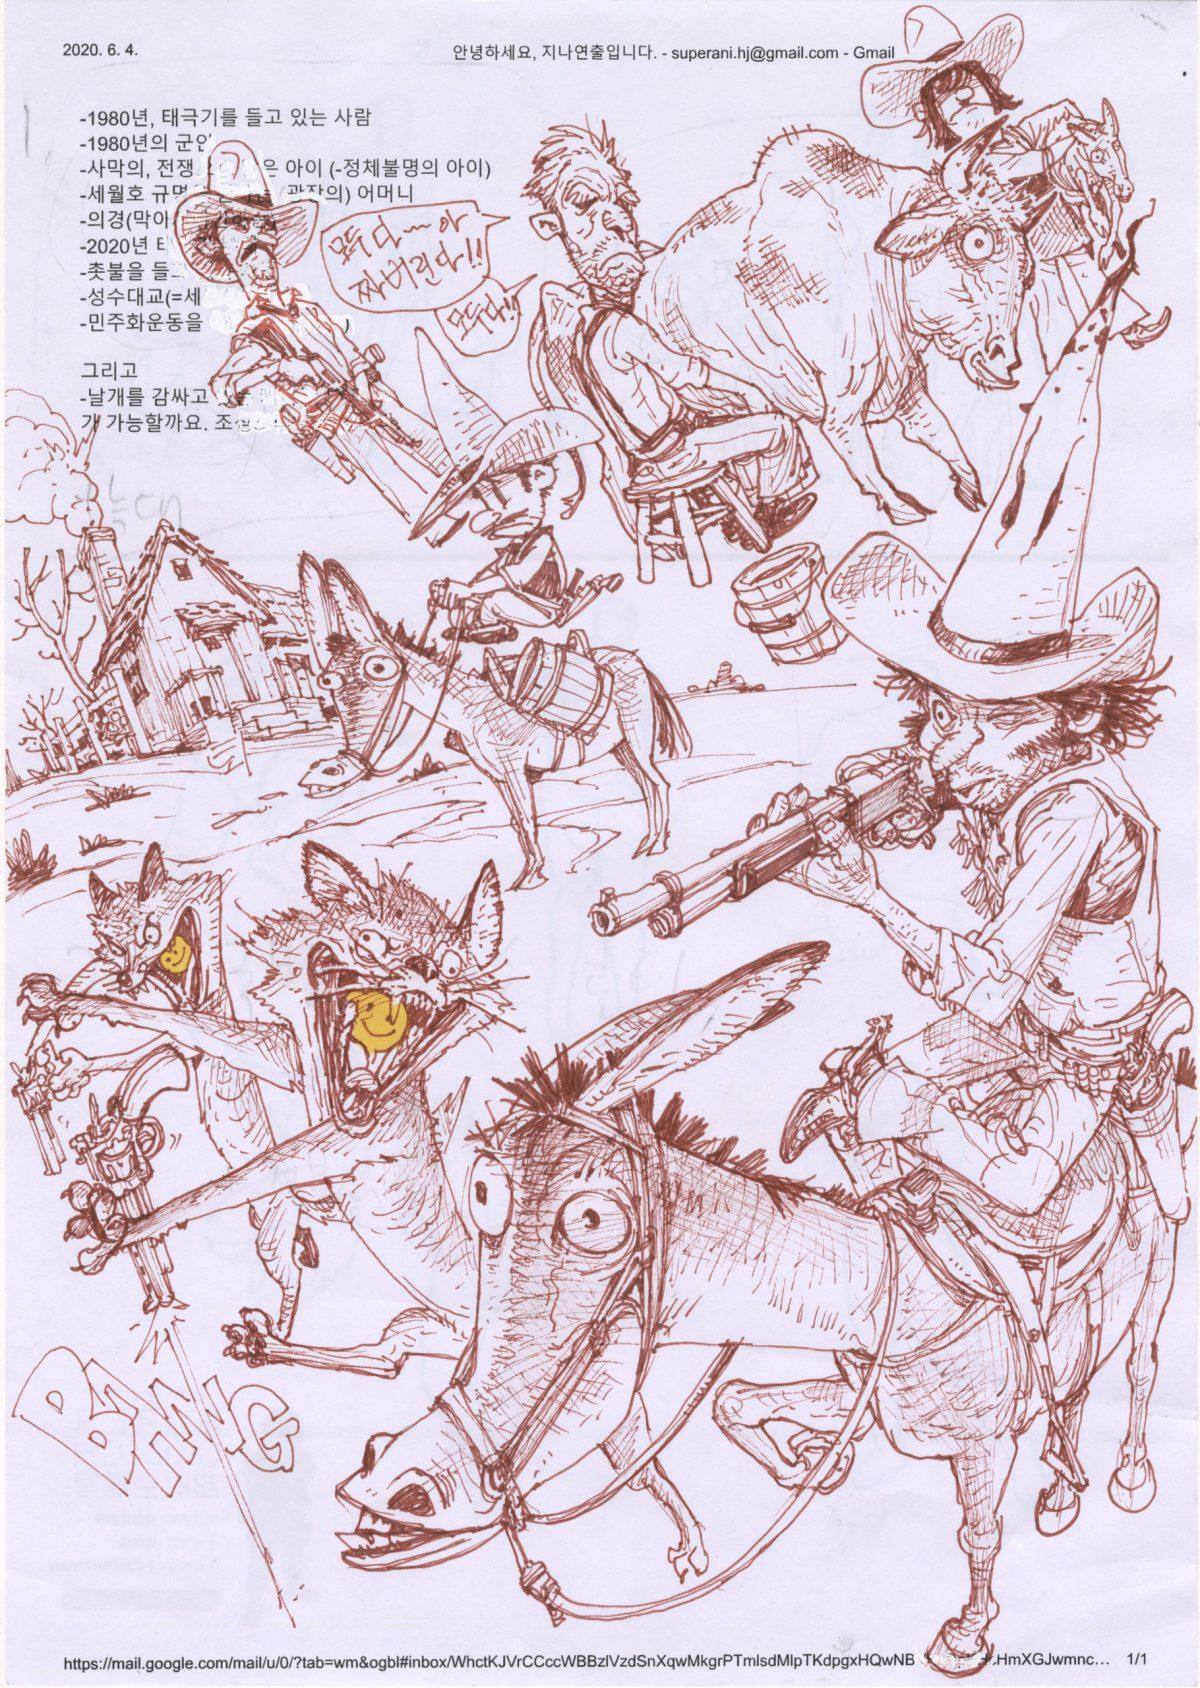 06/10/2020 - artworks